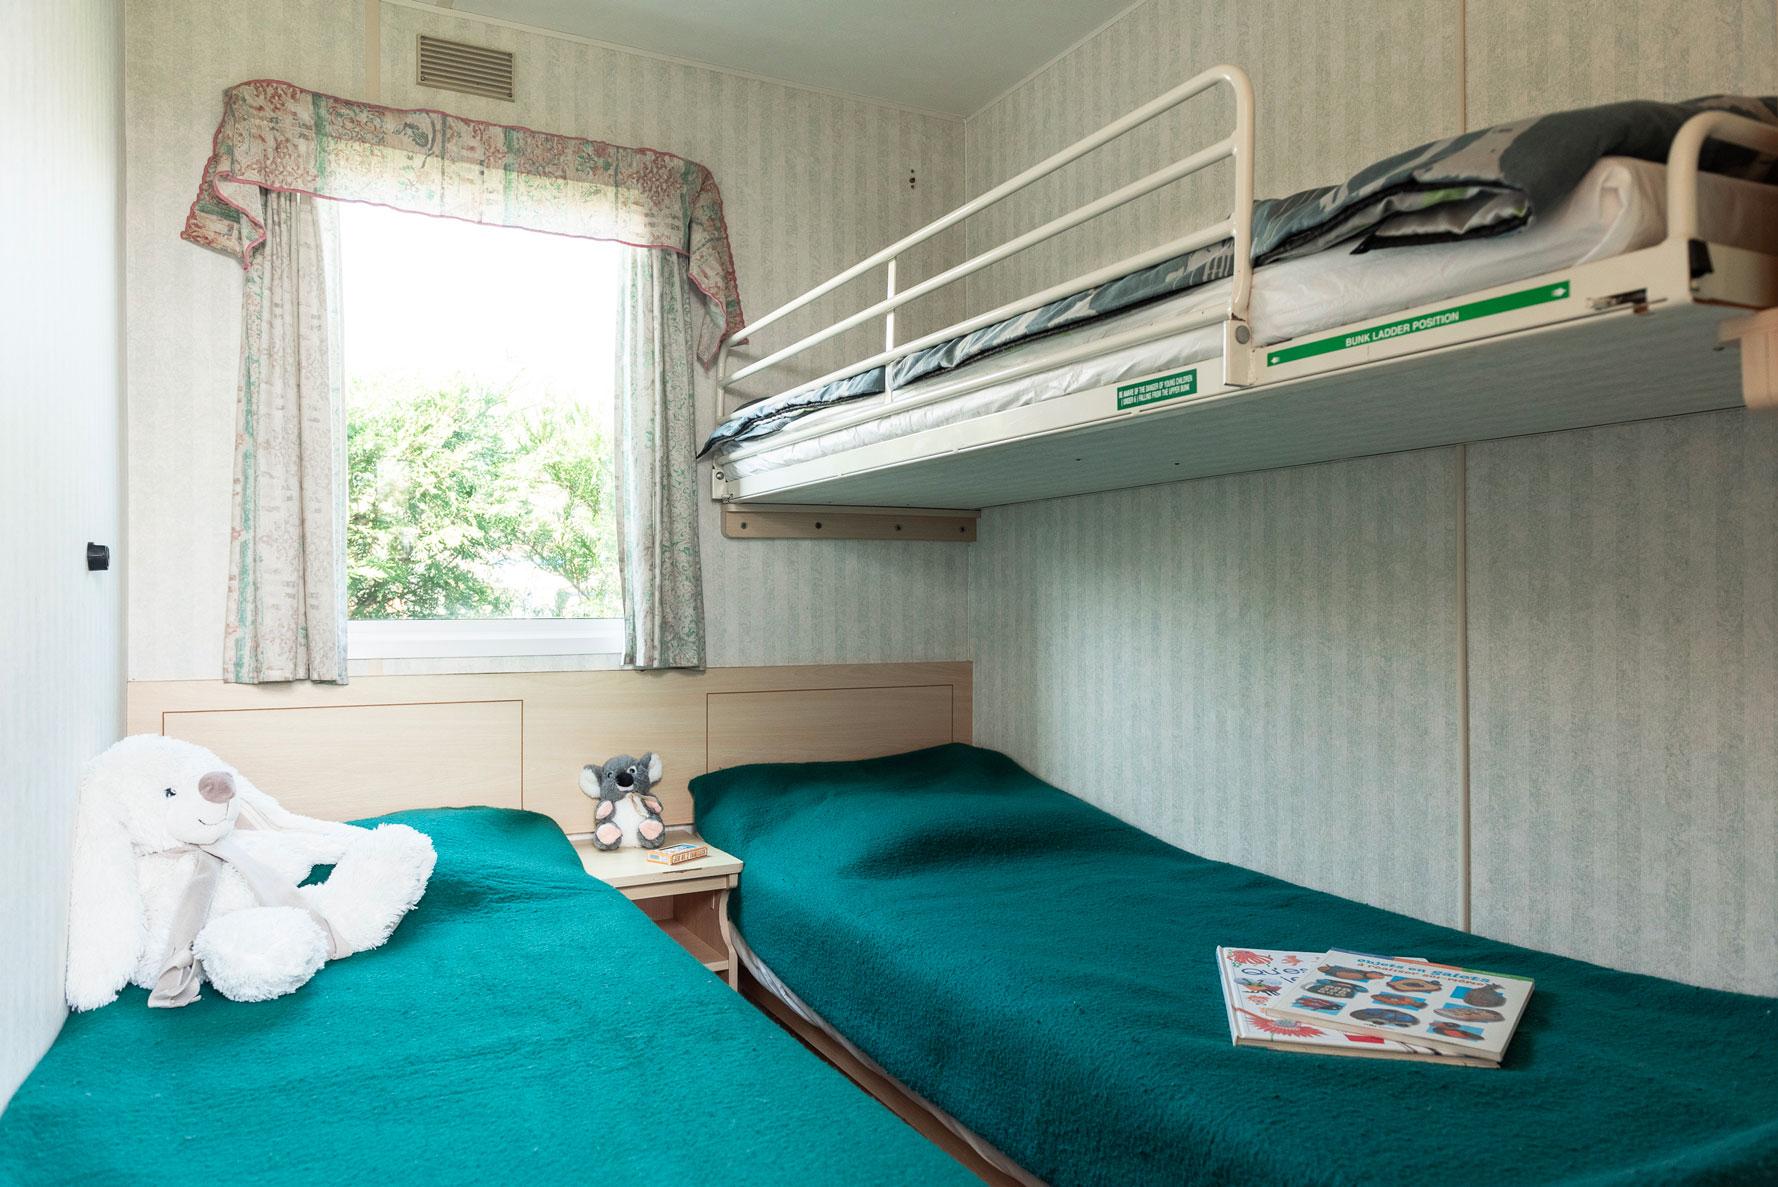 location-mobil-home-6-8-personnes-eco-chambre-enfants-camping-le-port-de-moricq